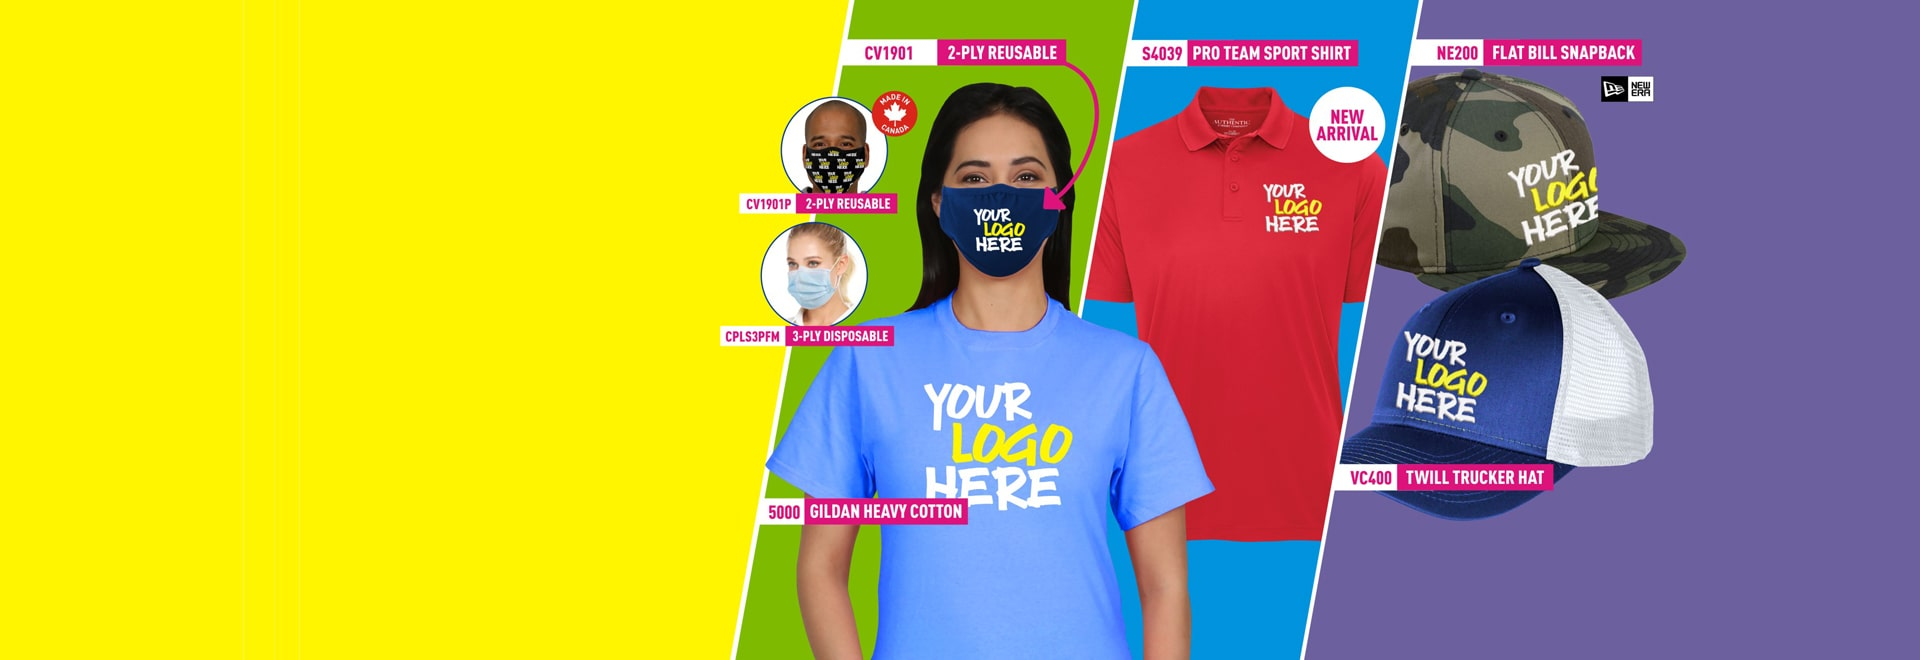 Global Merchandise Rush Live in Concert T-Shirt